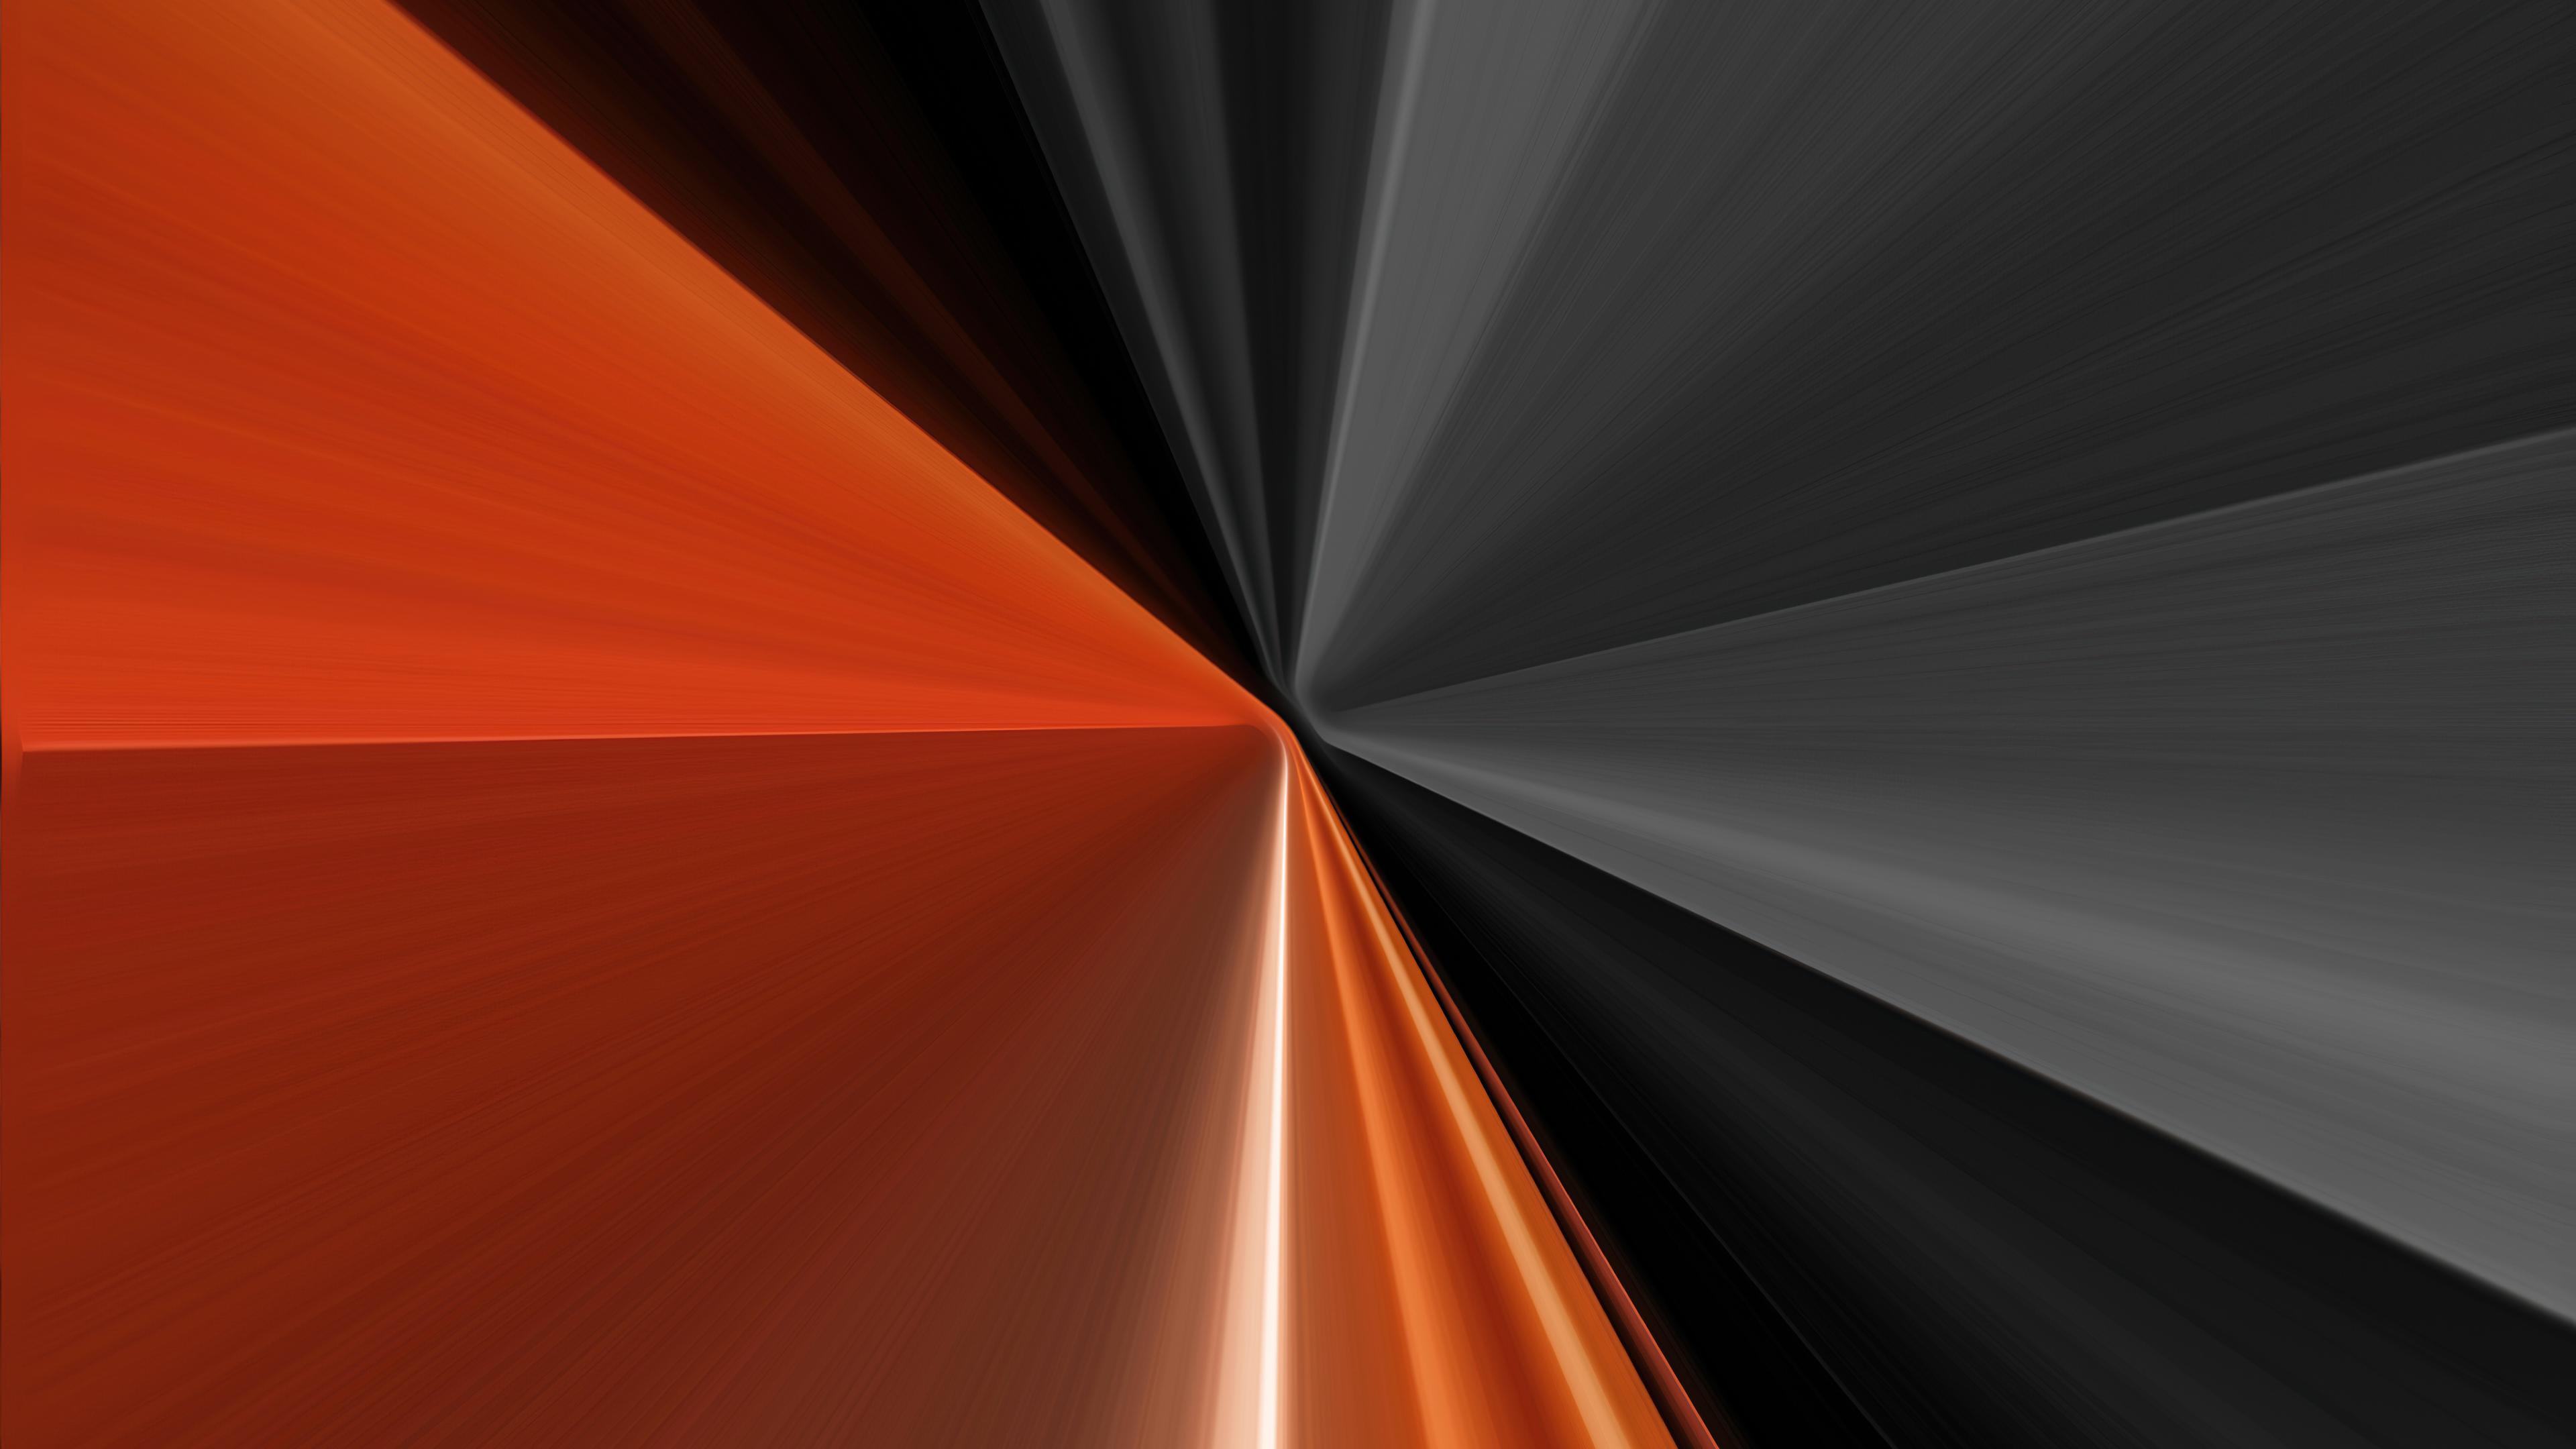 sharp lines grey orange 4k 1620164317 - Sharp Lines Grey Orange 4k - Sharp Lines Grey Orange 4k wallpapers